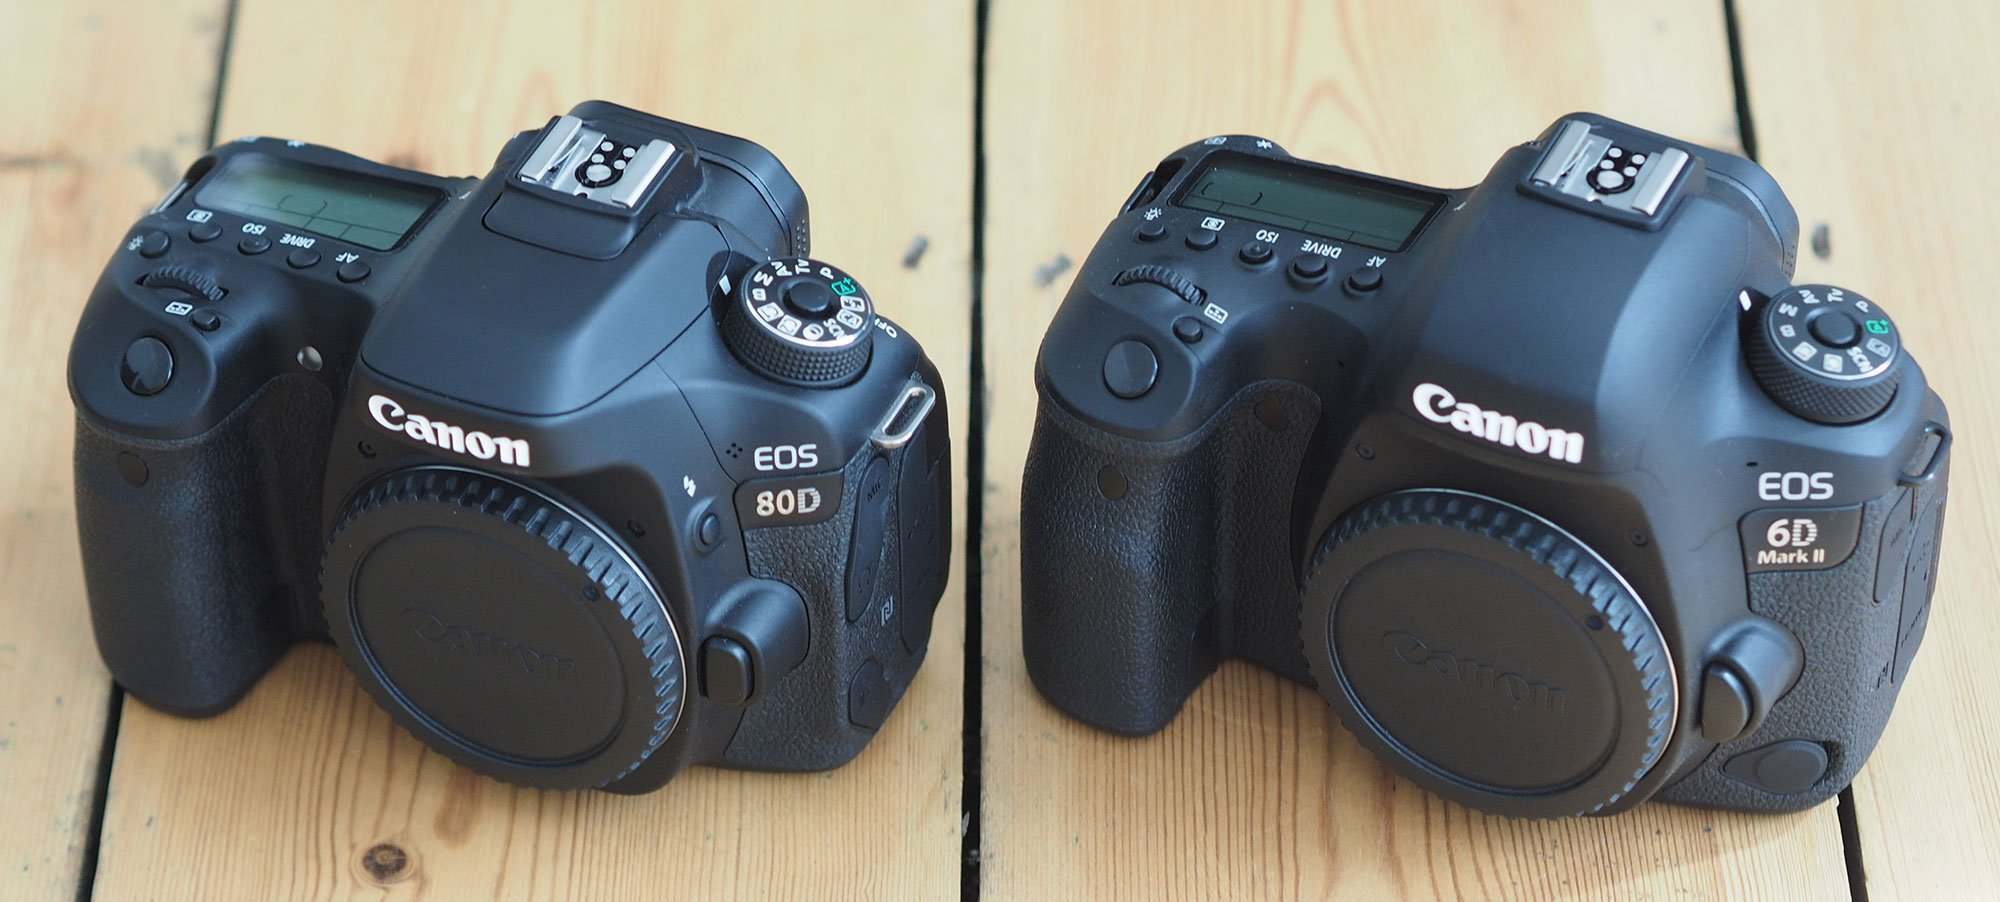 canon-eos-80d-6d-ii-top